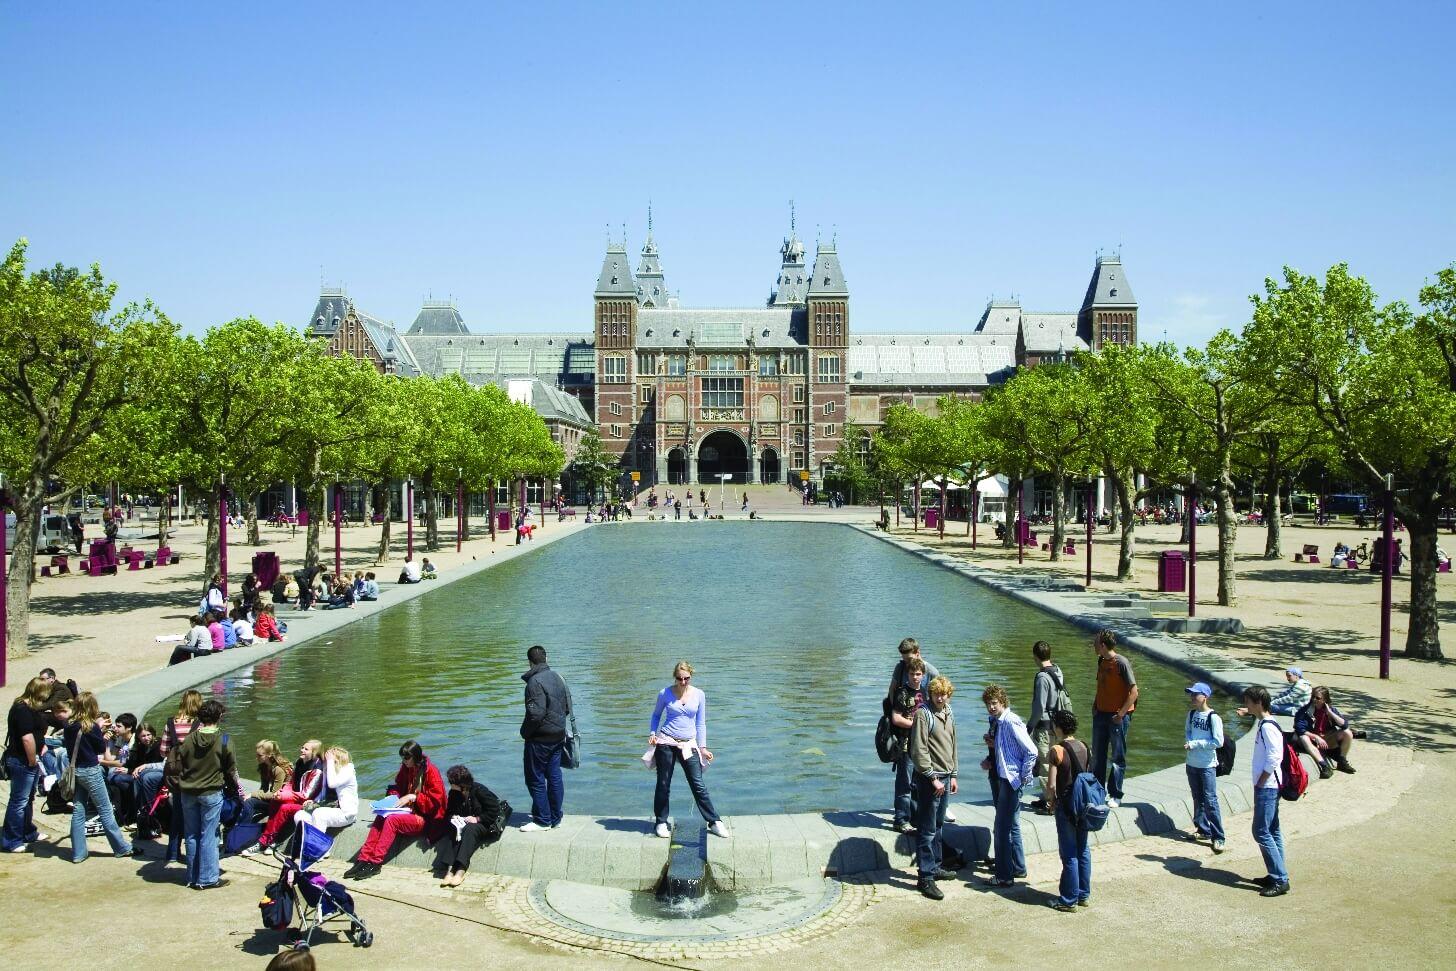 Rijksmuseum, Rijks, Amsterdam